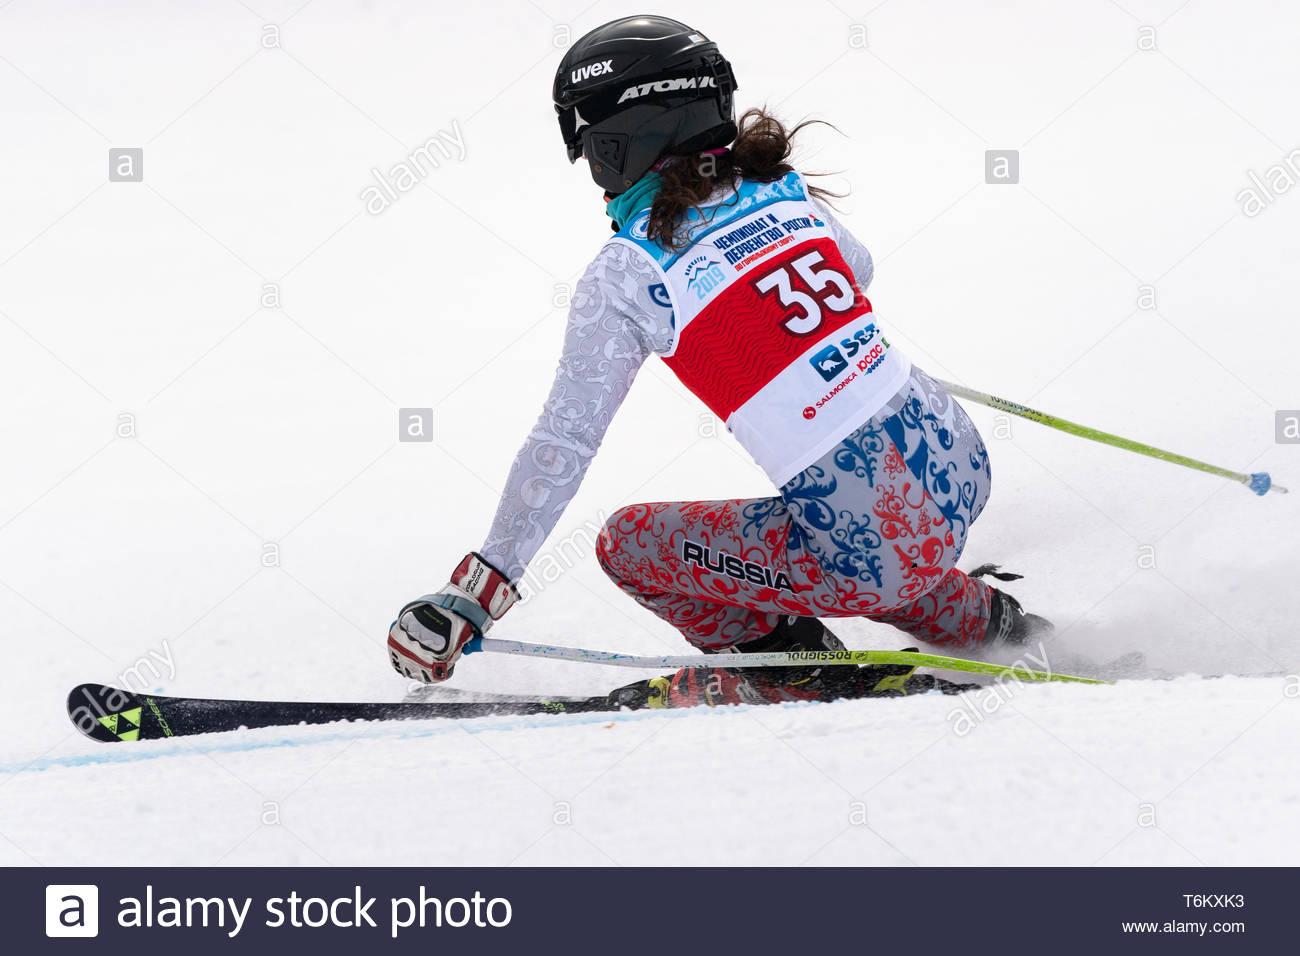 KAMCHATKA PENINSULA, RUSSIA - APR 2, 2019: Mountain skier Delkhman Polina (Krasnoyarsk) skiing down mount. Russian Women's Alpine Skiing Cup, Internat - Stock Image